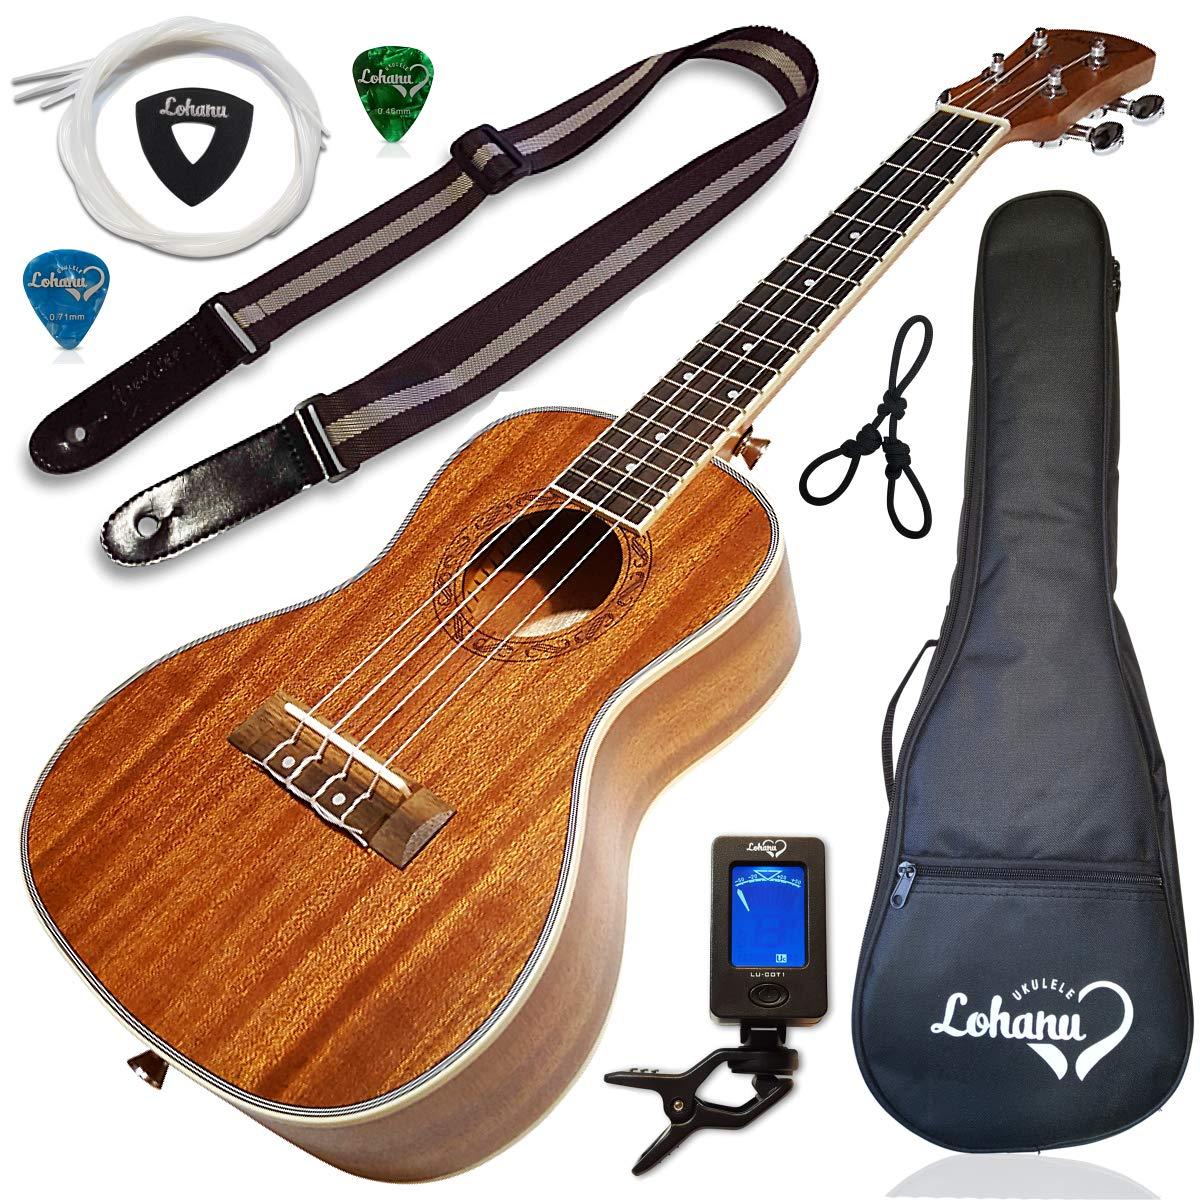 lohanu ukulele lessons san clemente.jpg